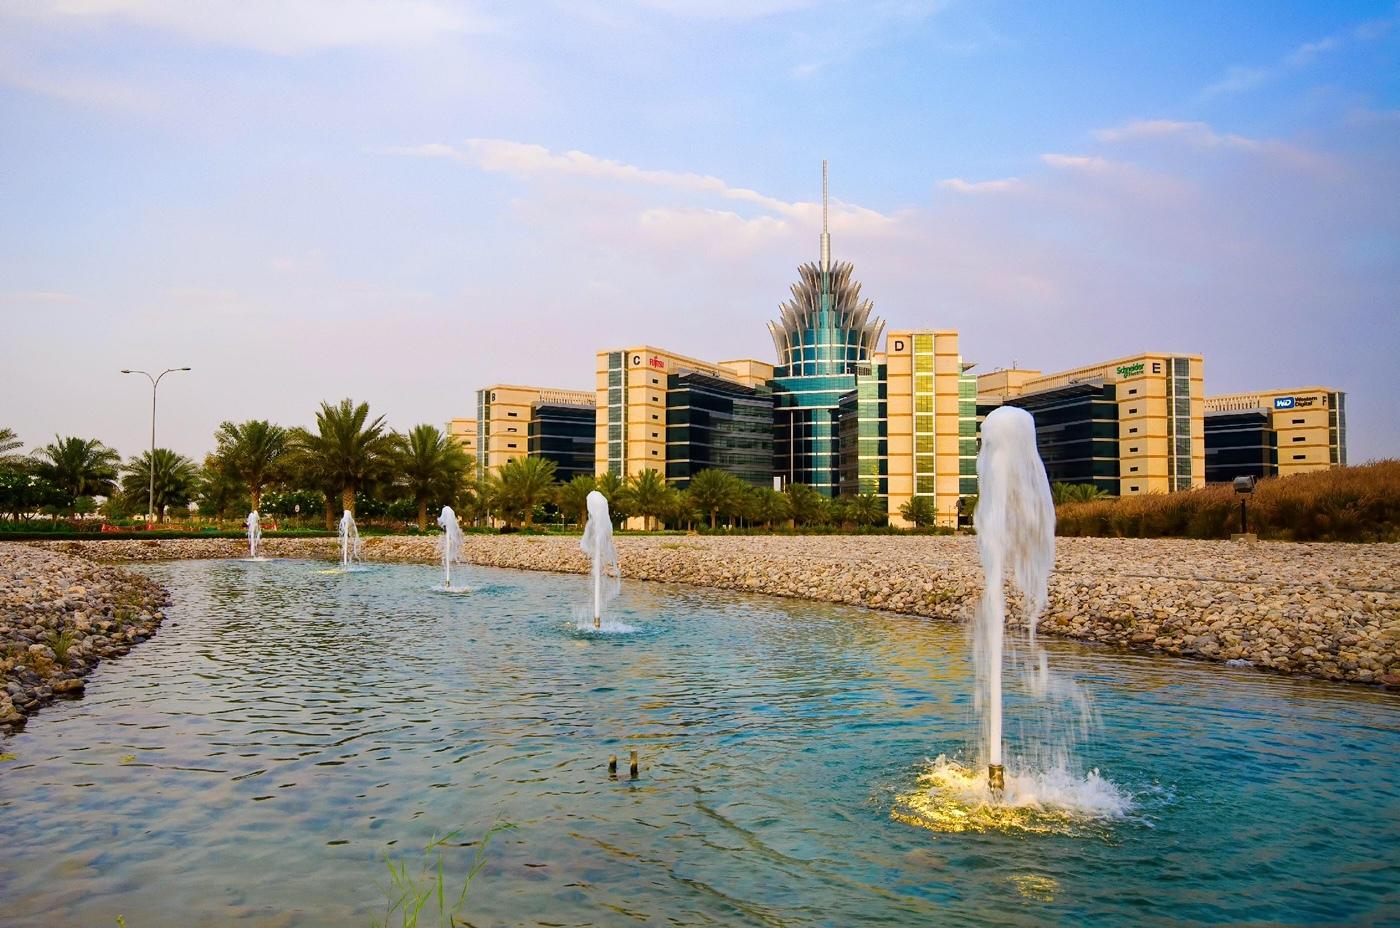 Dubai Silicon Oasis Authority (DSOA) HQ Building (Photo: ME NewsWire)